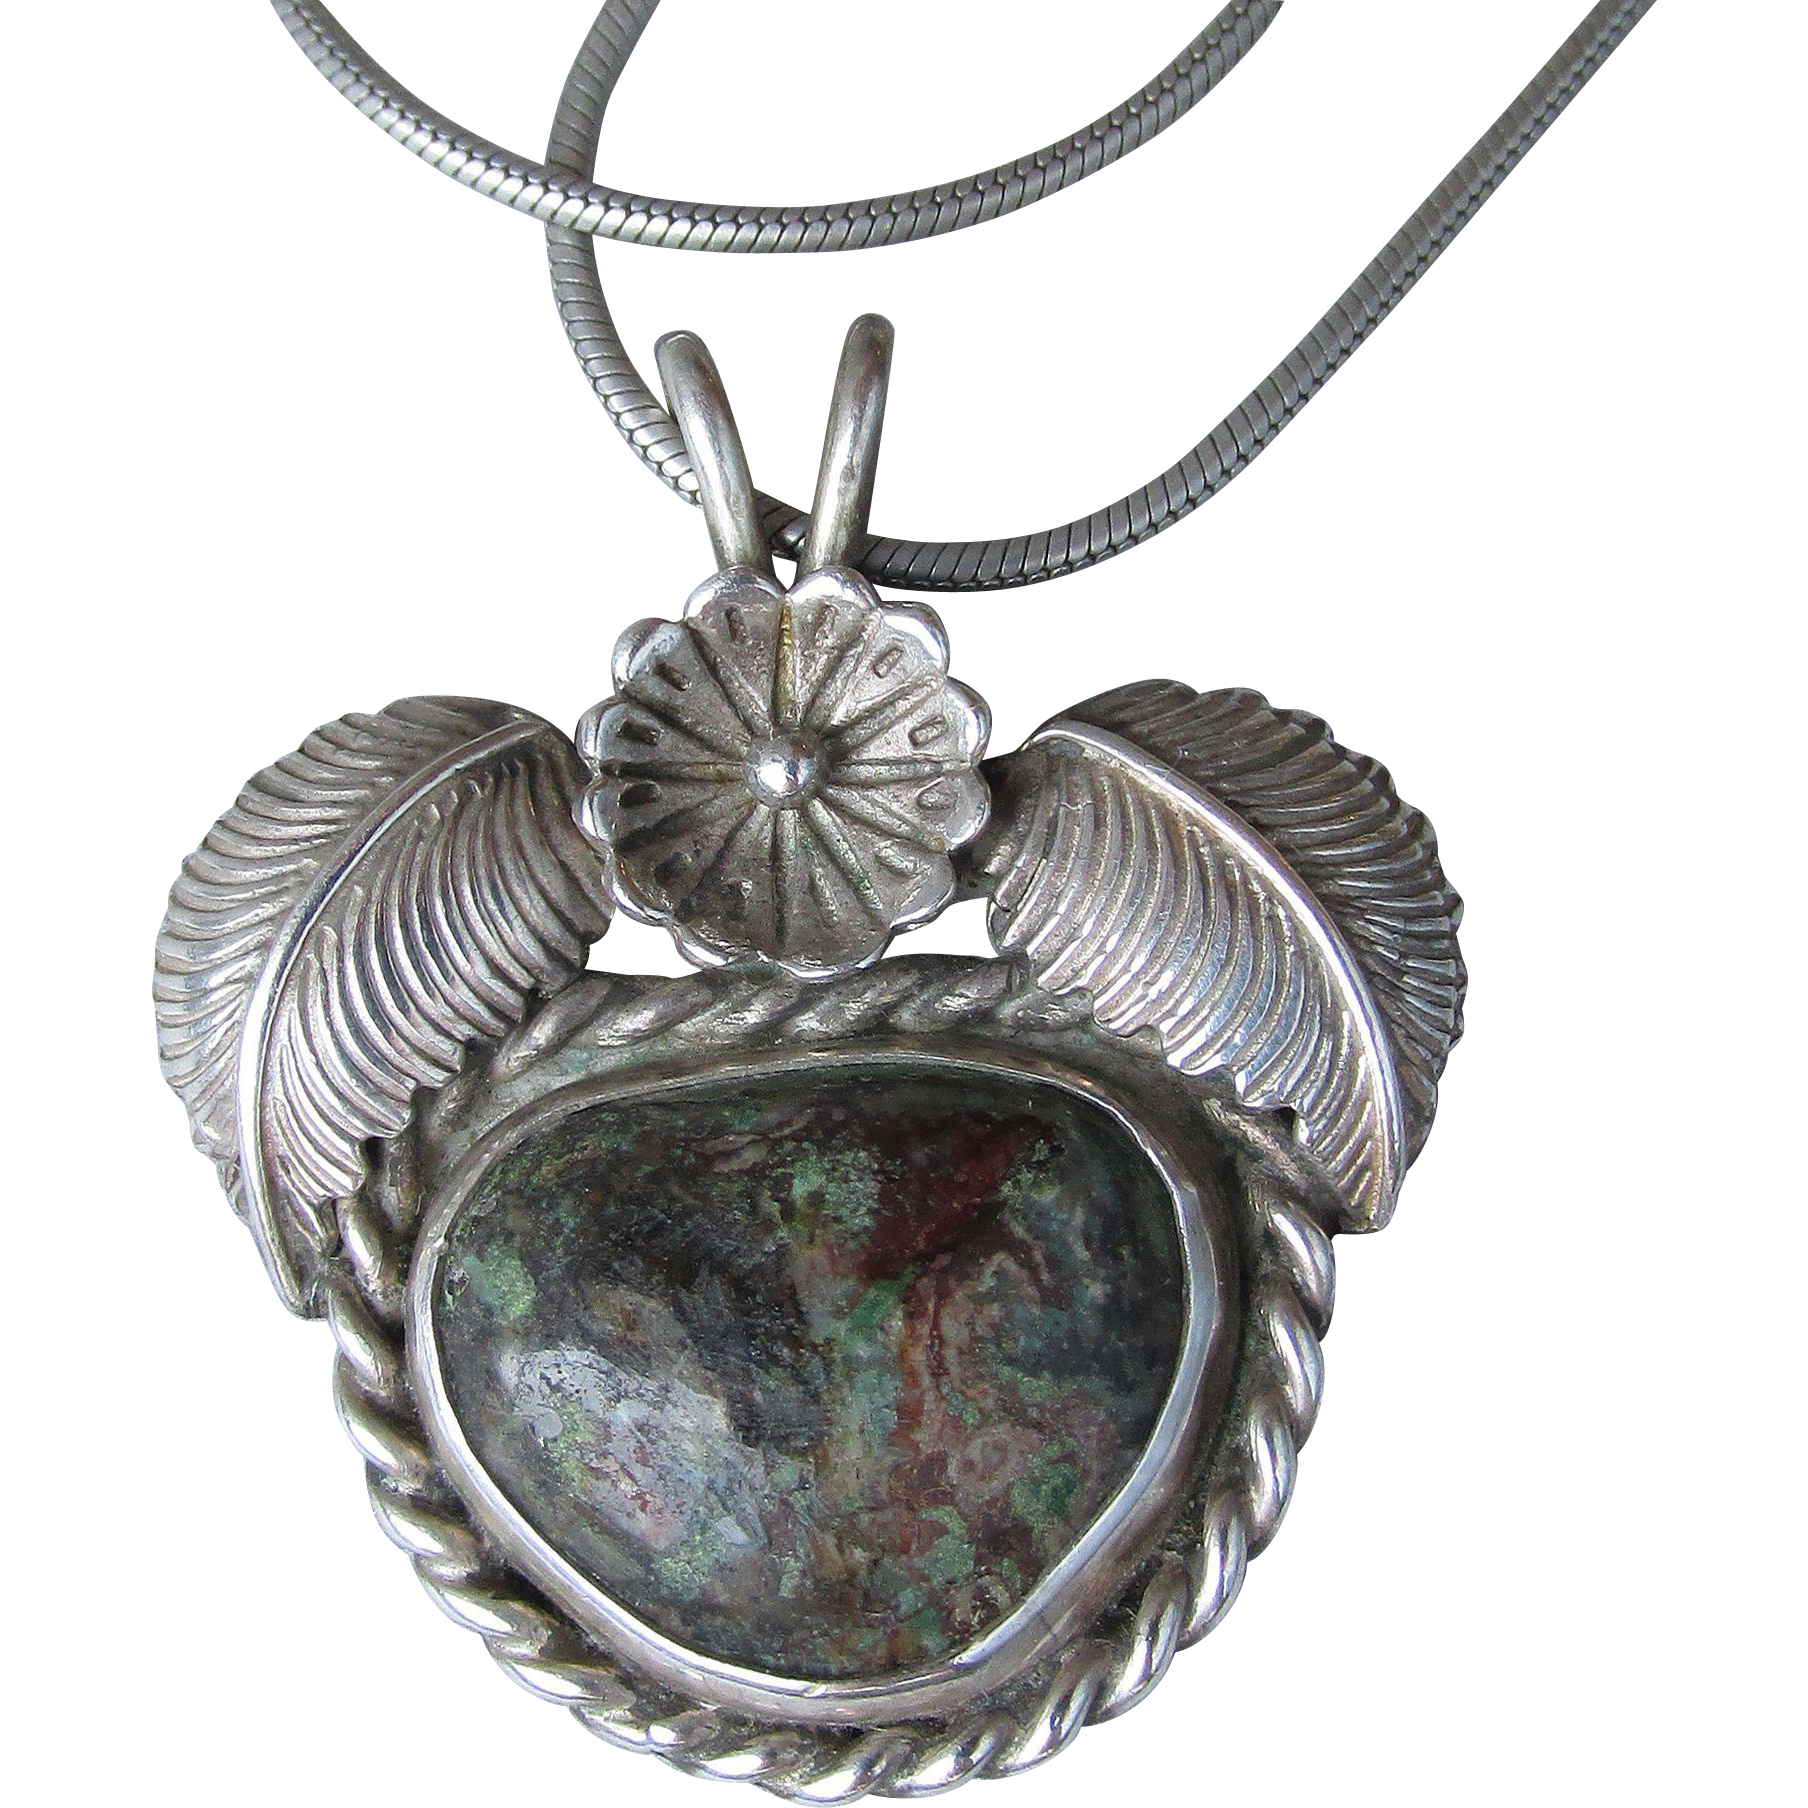 Navajo Native American Jasper Feather & Flower Vintage Sterling Silver Pendant Necklace